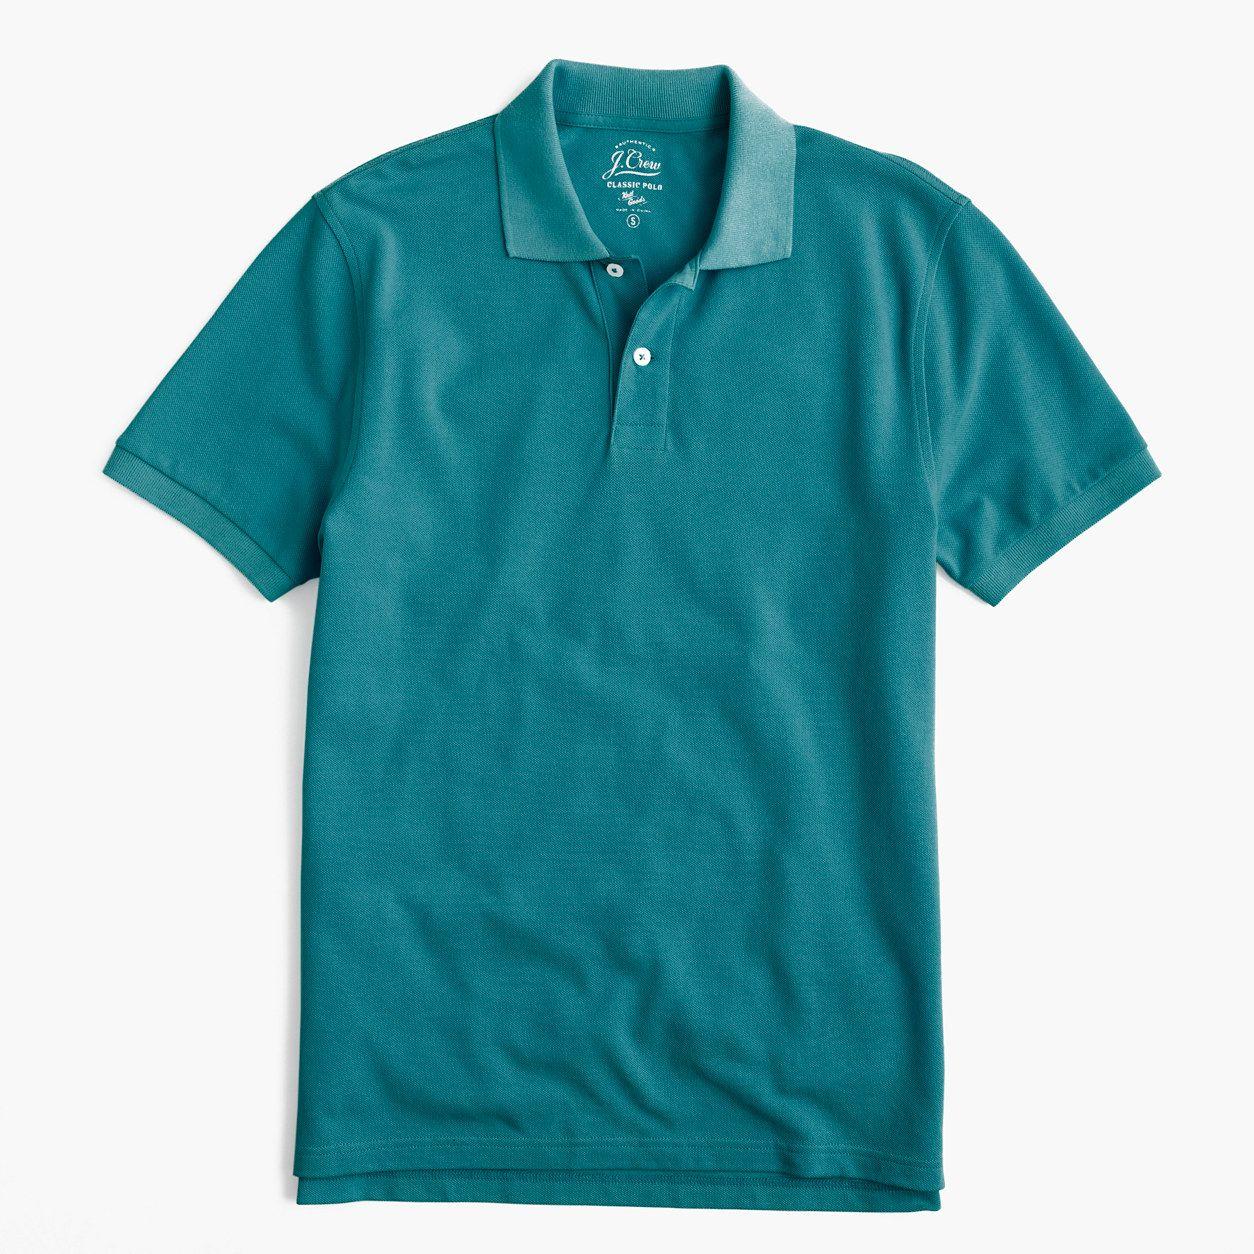 ccb51e6dd21 J.Crew Mens Slim Classic Piqué Polo Shirt (Size XS)   Products ...